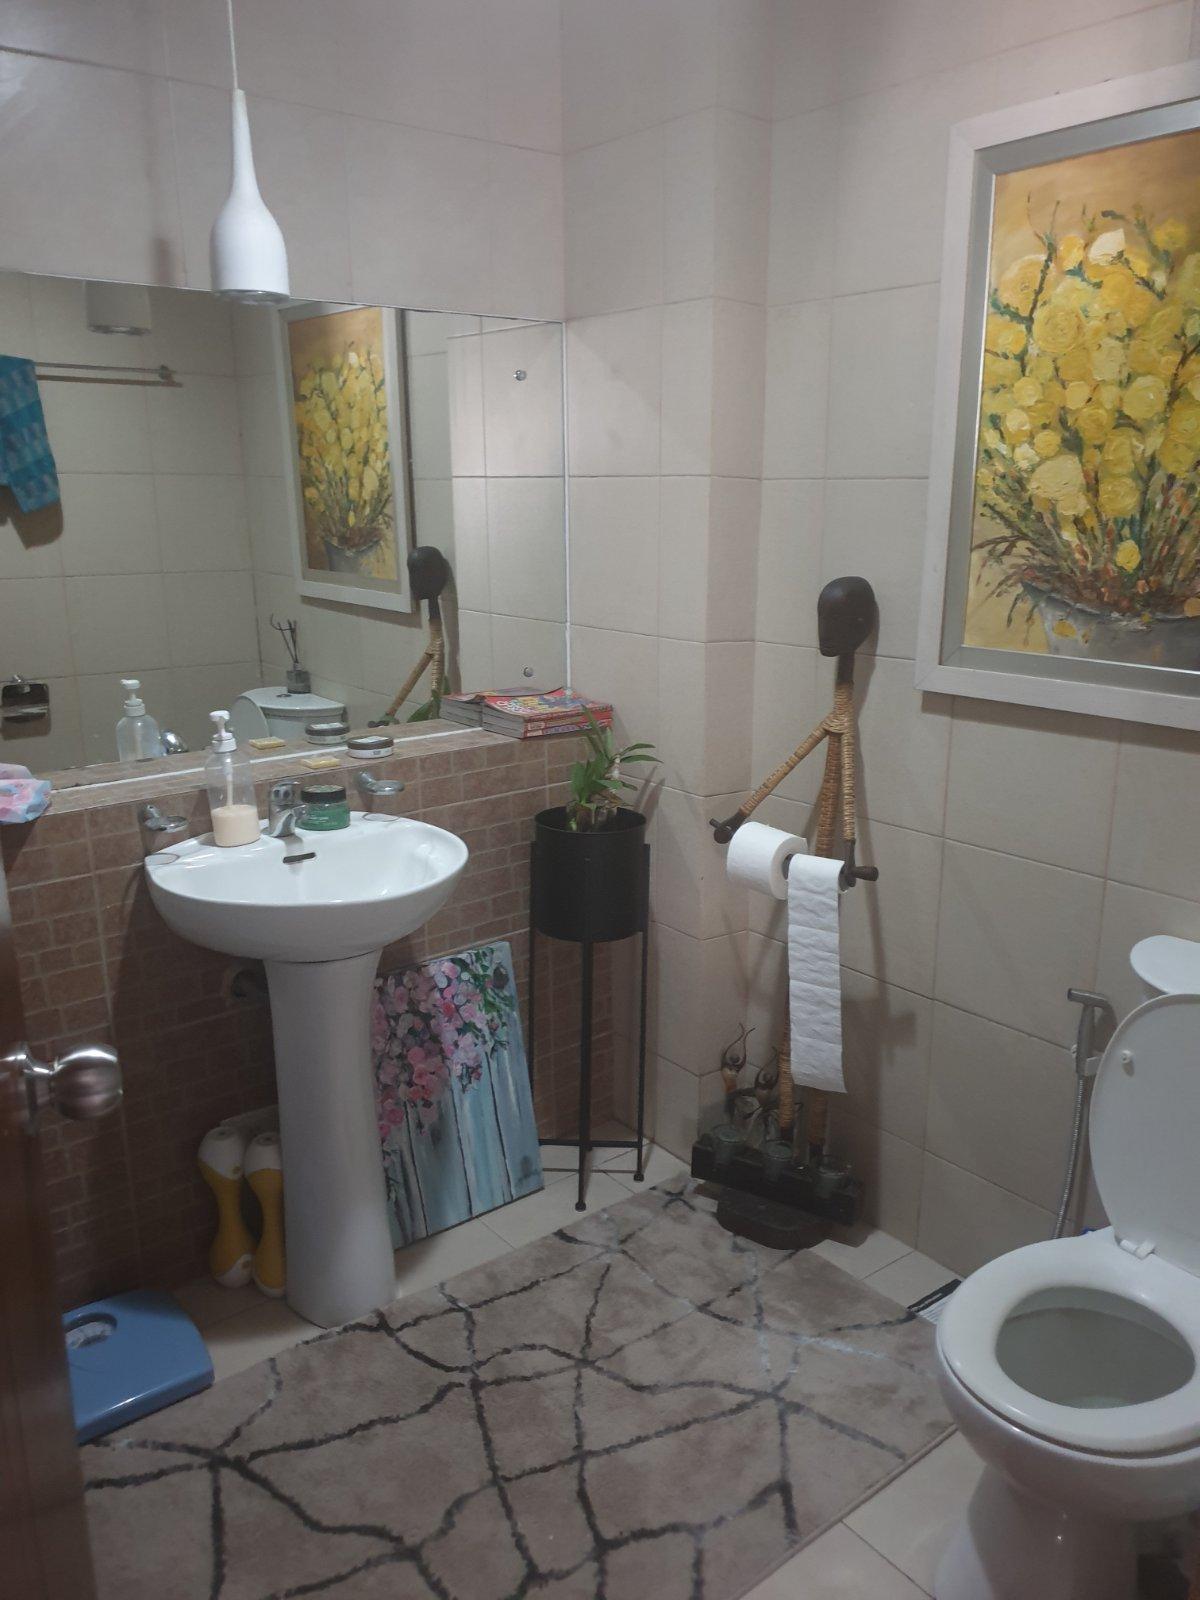 4BR Townhouse For Sale, Greenhills Courtyard, Little Baguio, San Juan City 8